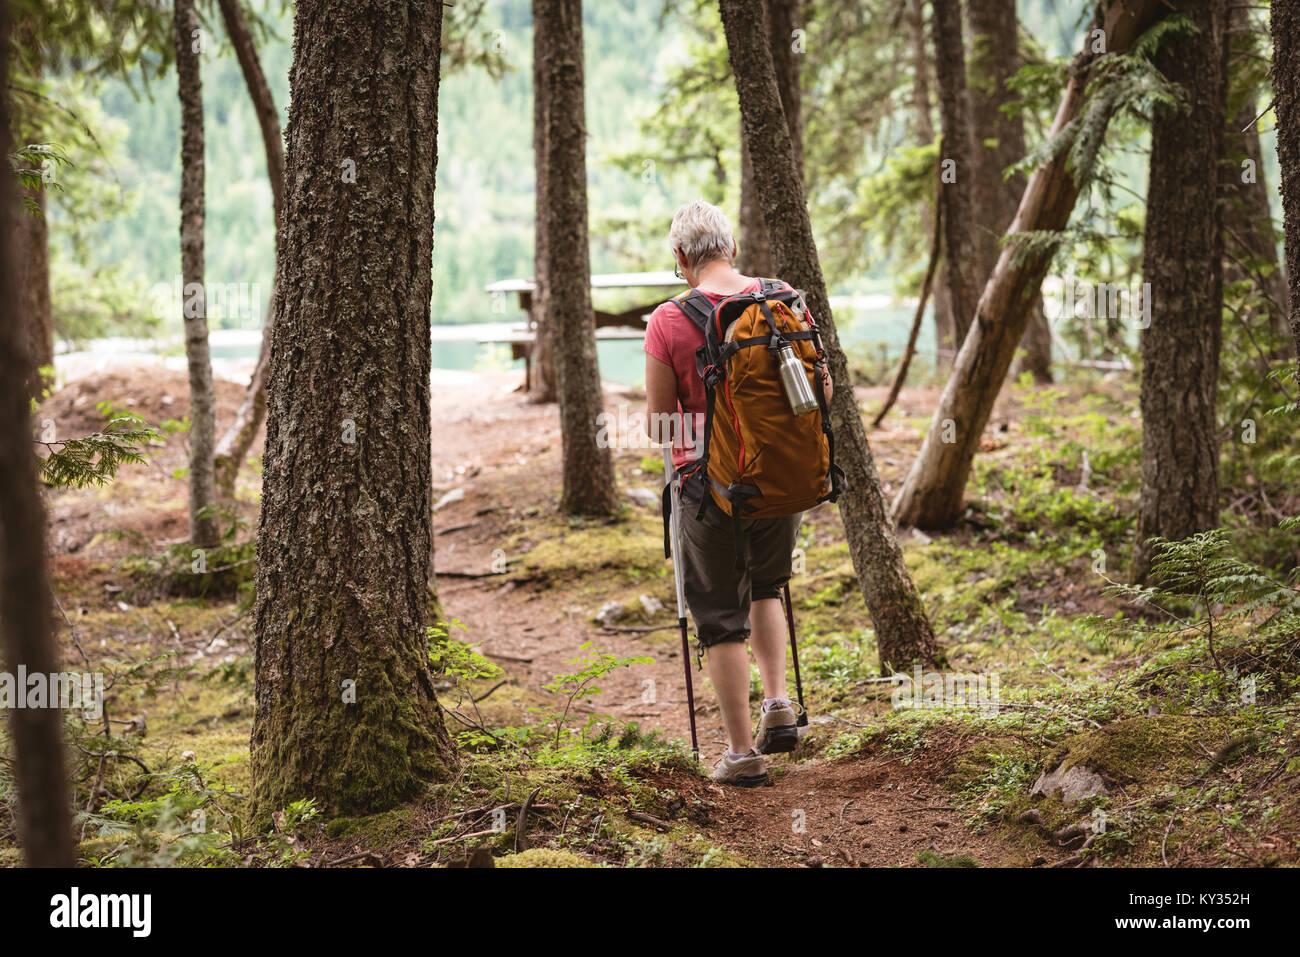 Reife Frau Wandern im Wald Stockbild